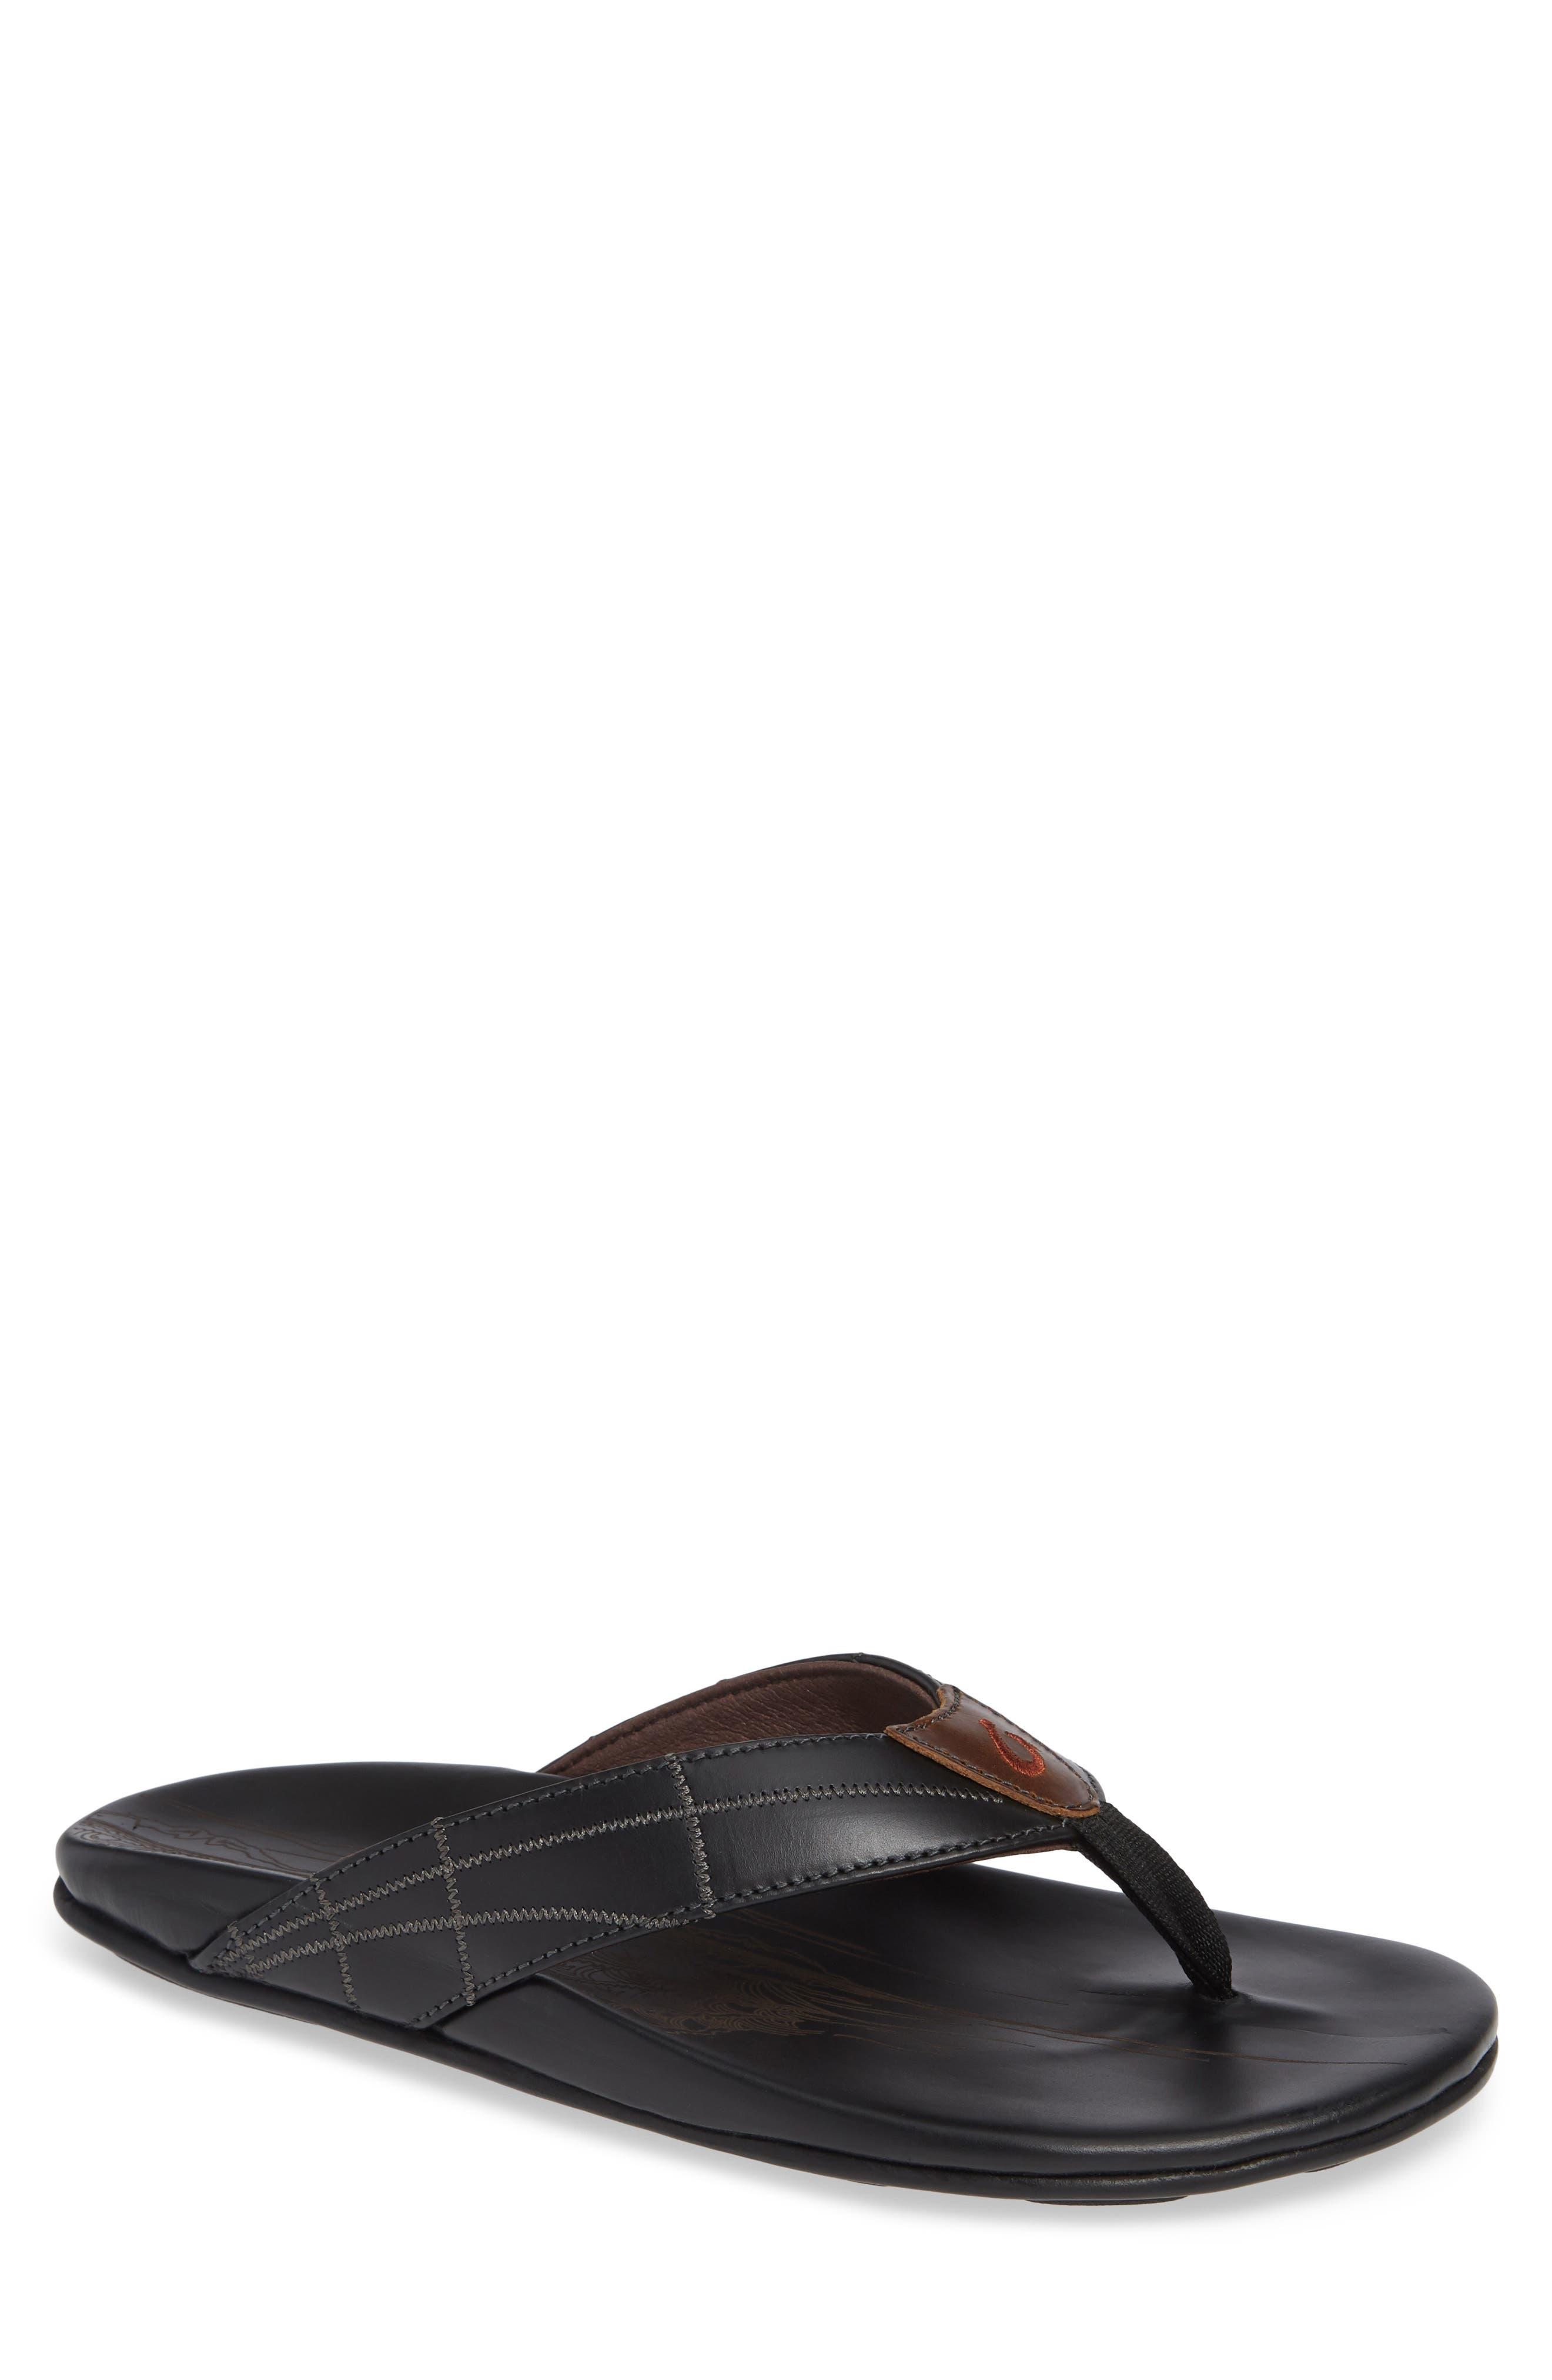 Hokule A Kia Flip Flop,                         Main,                         color, BLACK/ BLACK